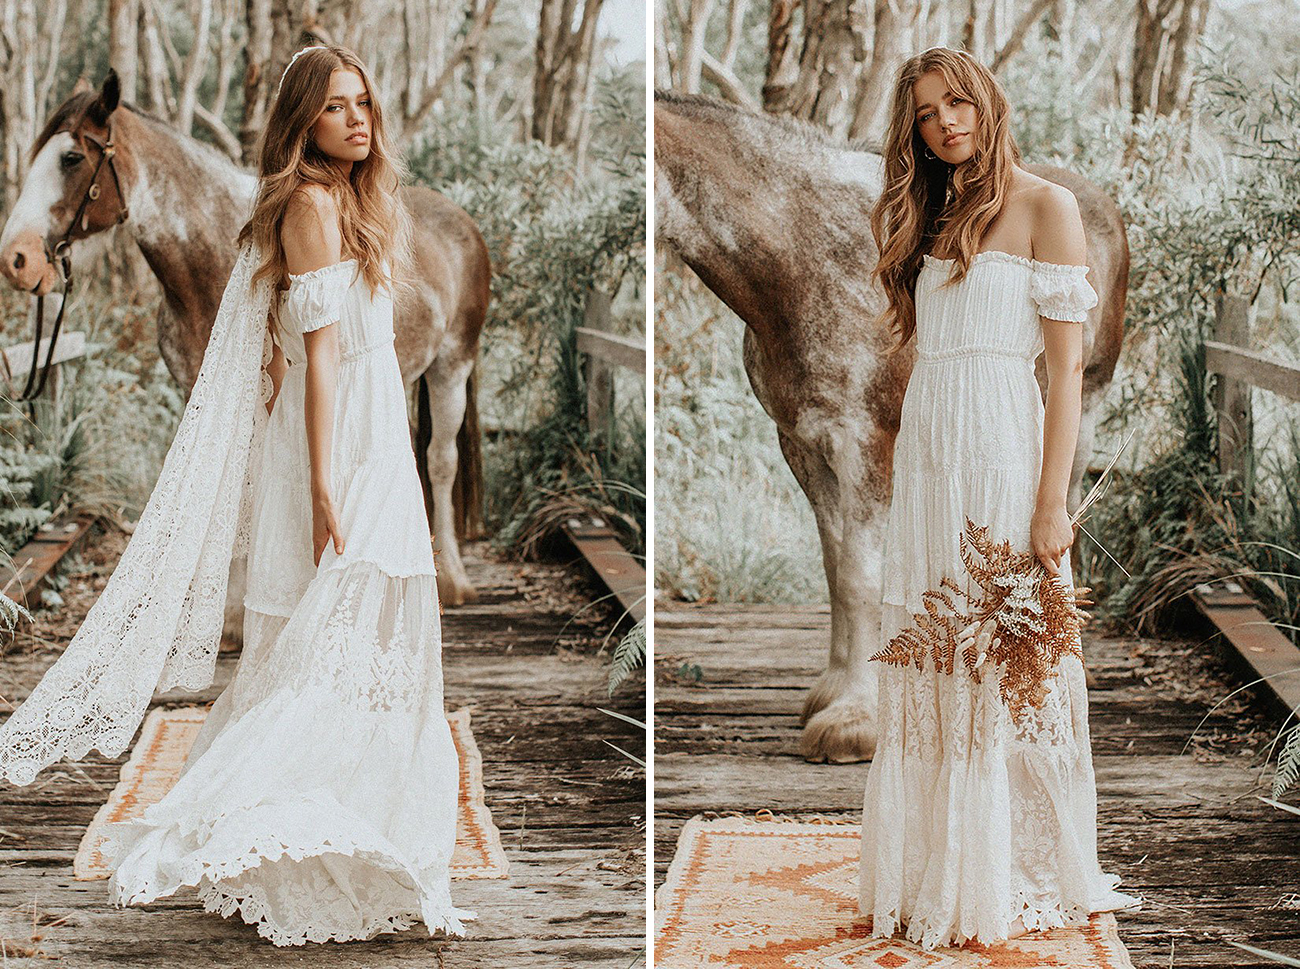 Spell Designs Modern Lace Wedding Dress Under $800 Budget